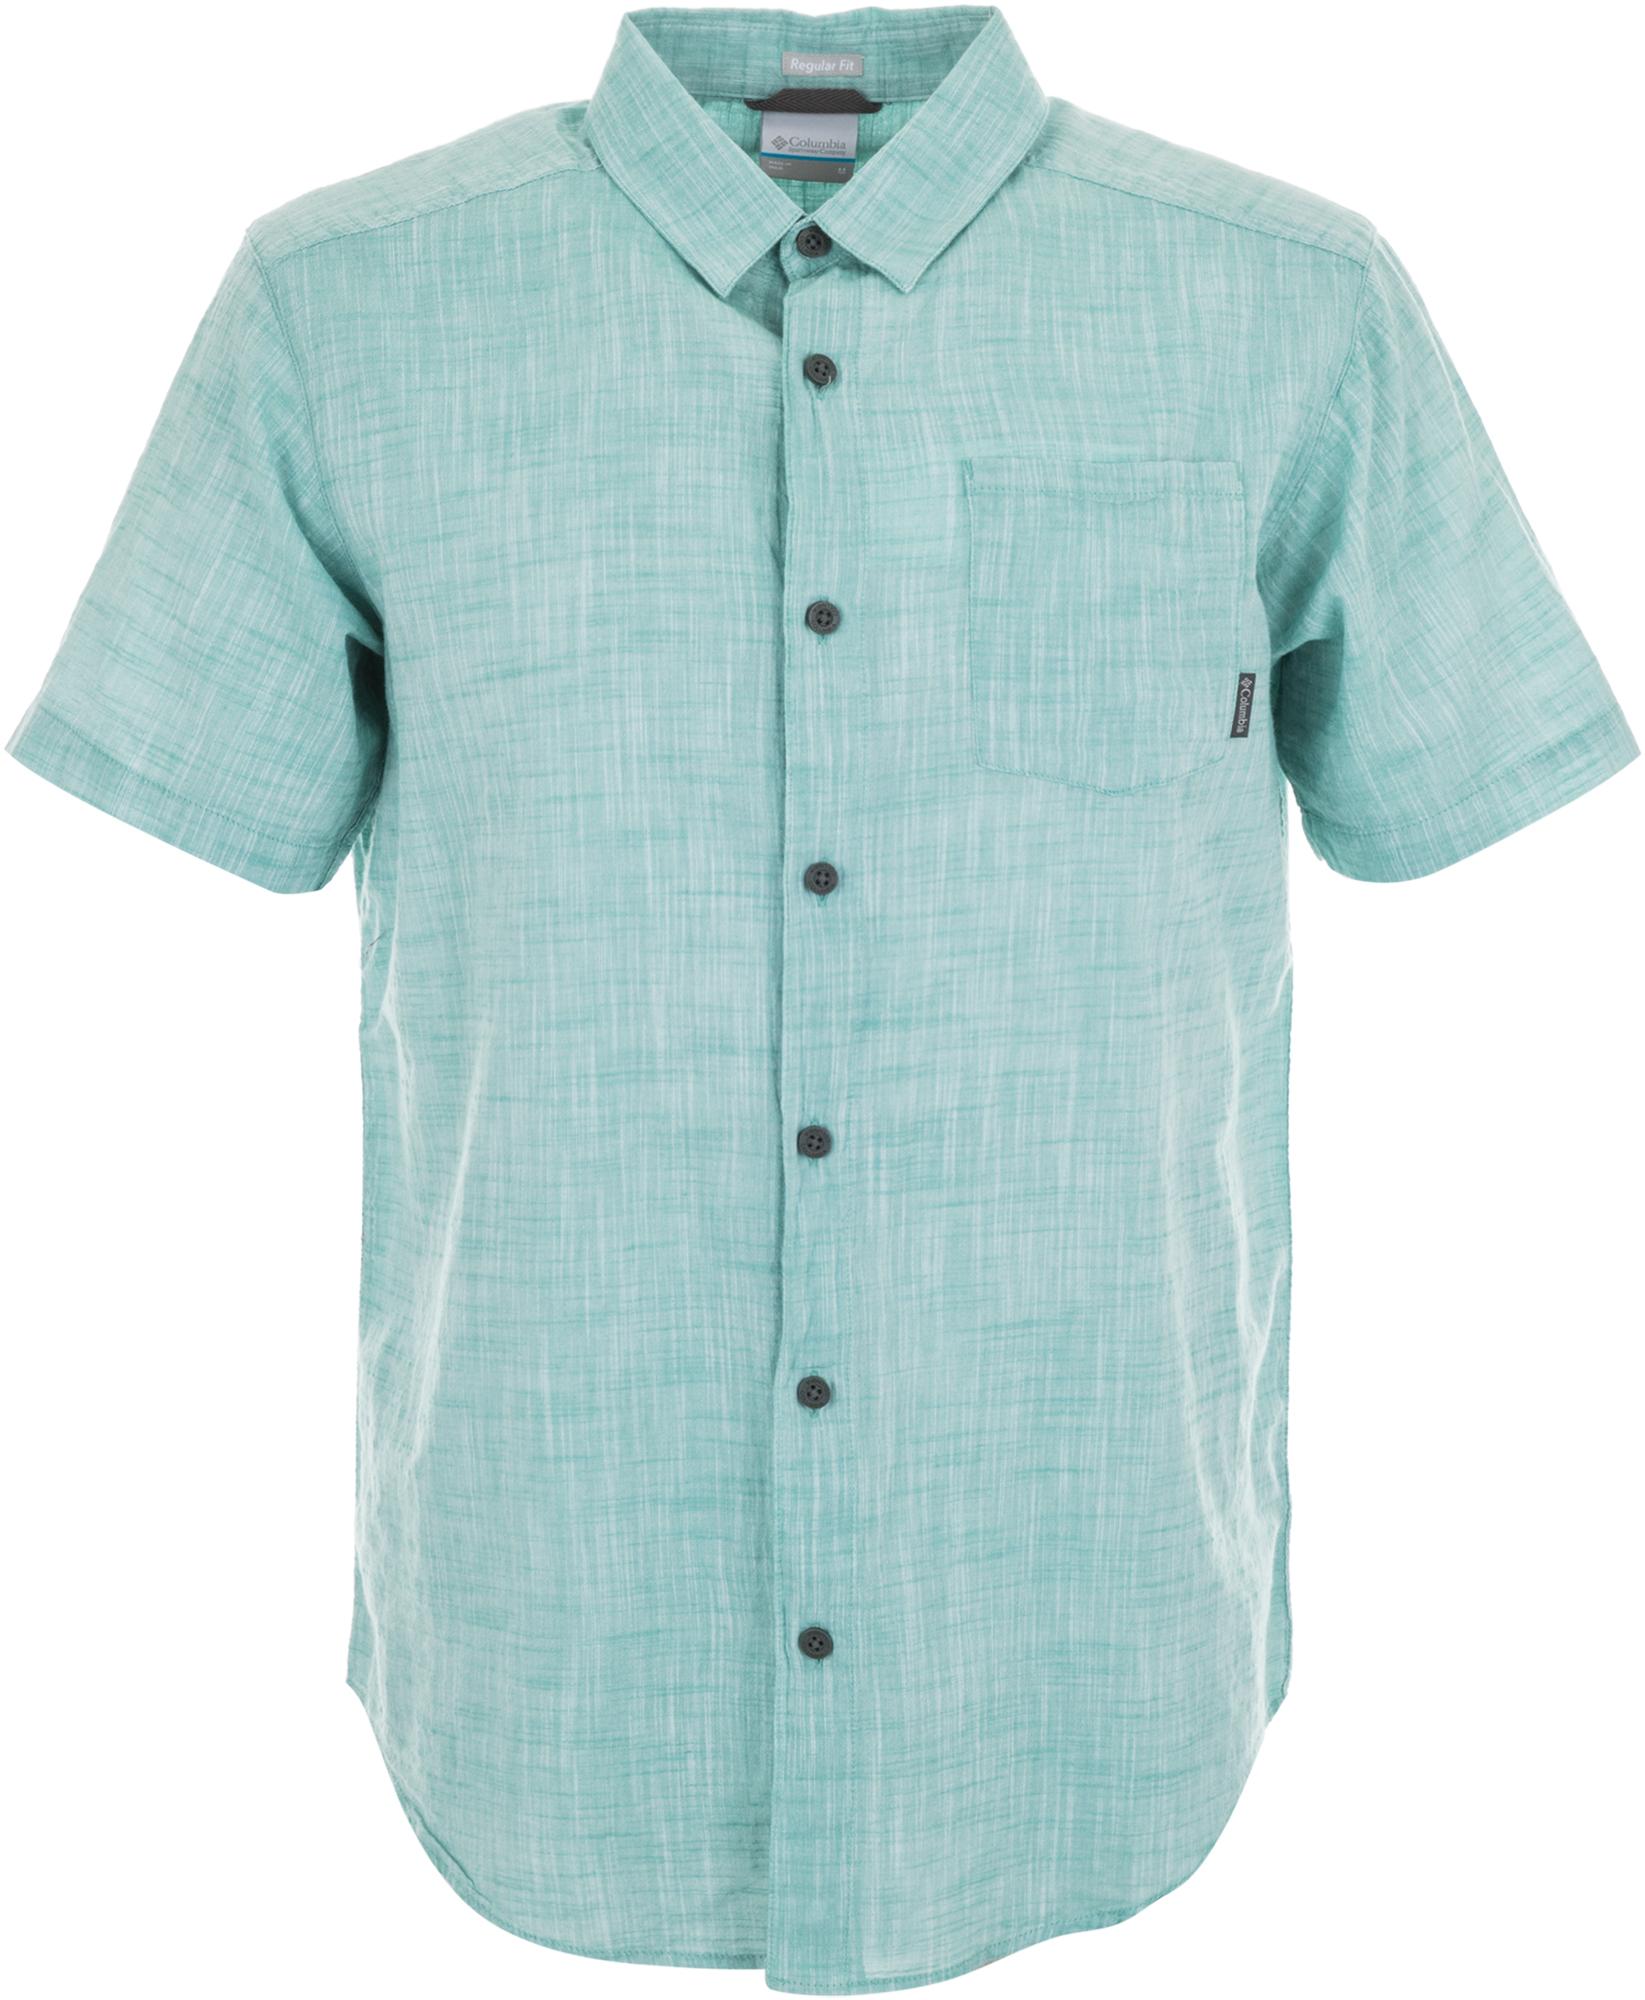 купить Columbia Рубашка мужская Columbia Under Exposure YD, размер 56-58 по цене 1259 рублей